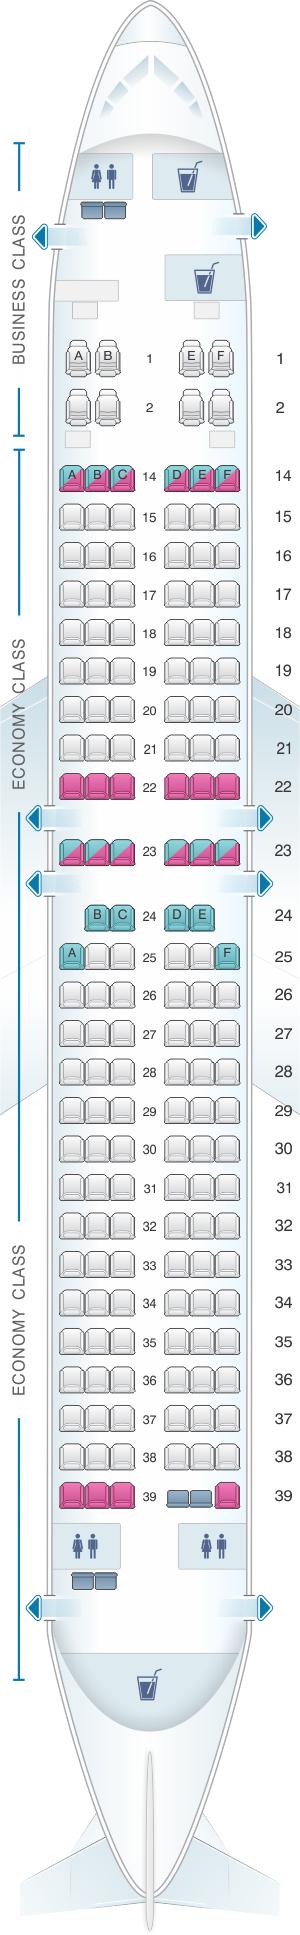 Seat Map Fiji Airways Boeing B737 800 164pax